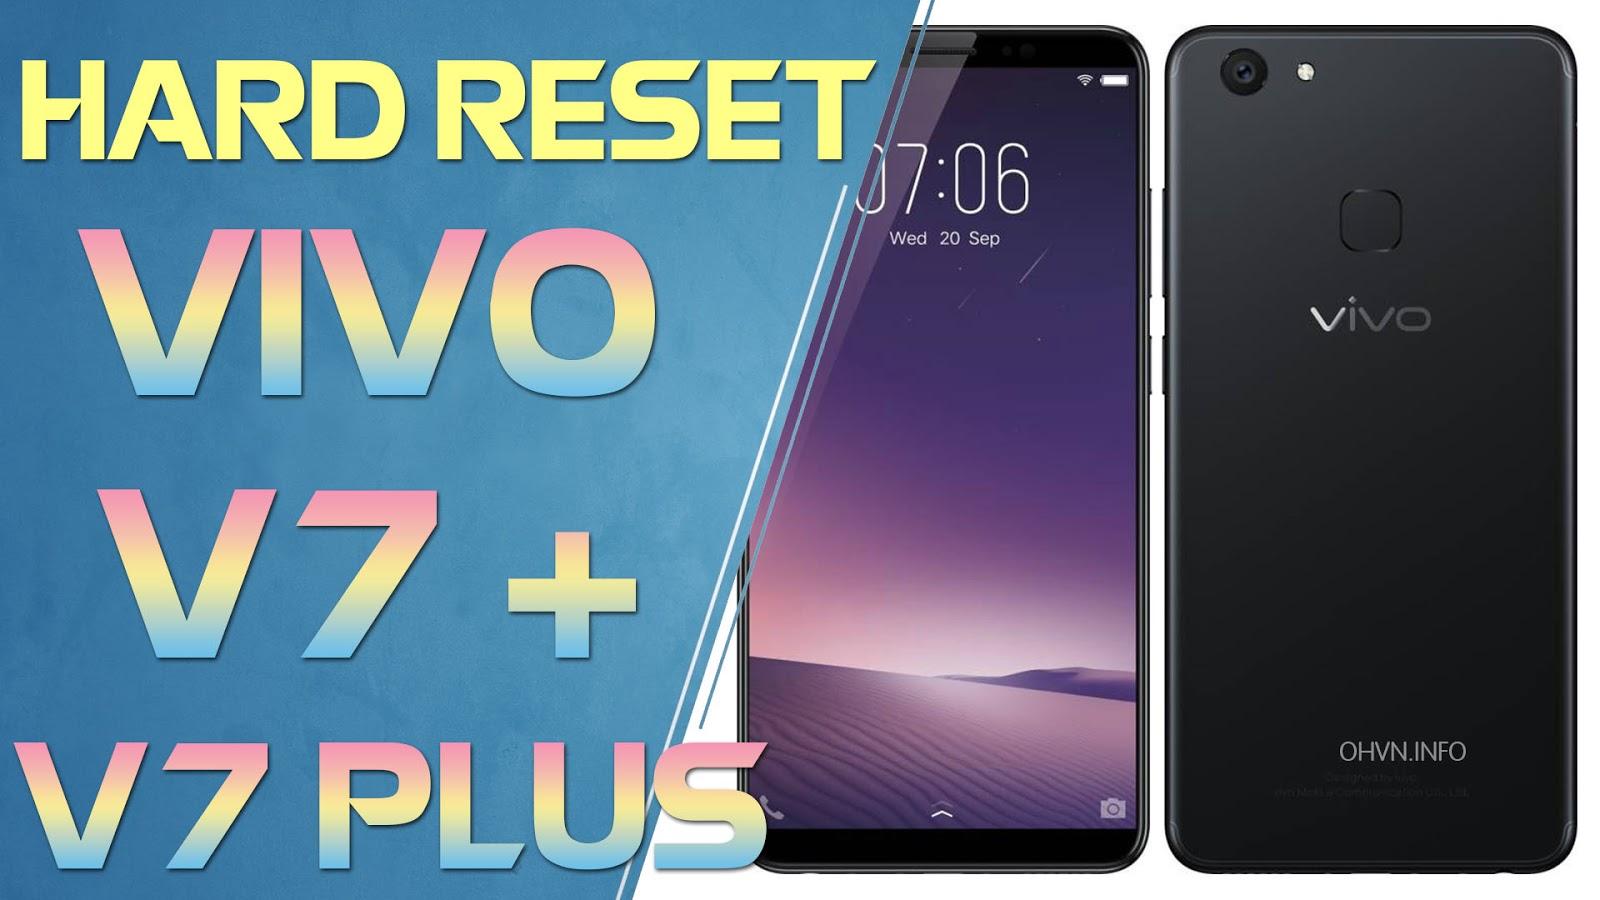 Hướng dẫn Hard Reset Vivo V7 Plus